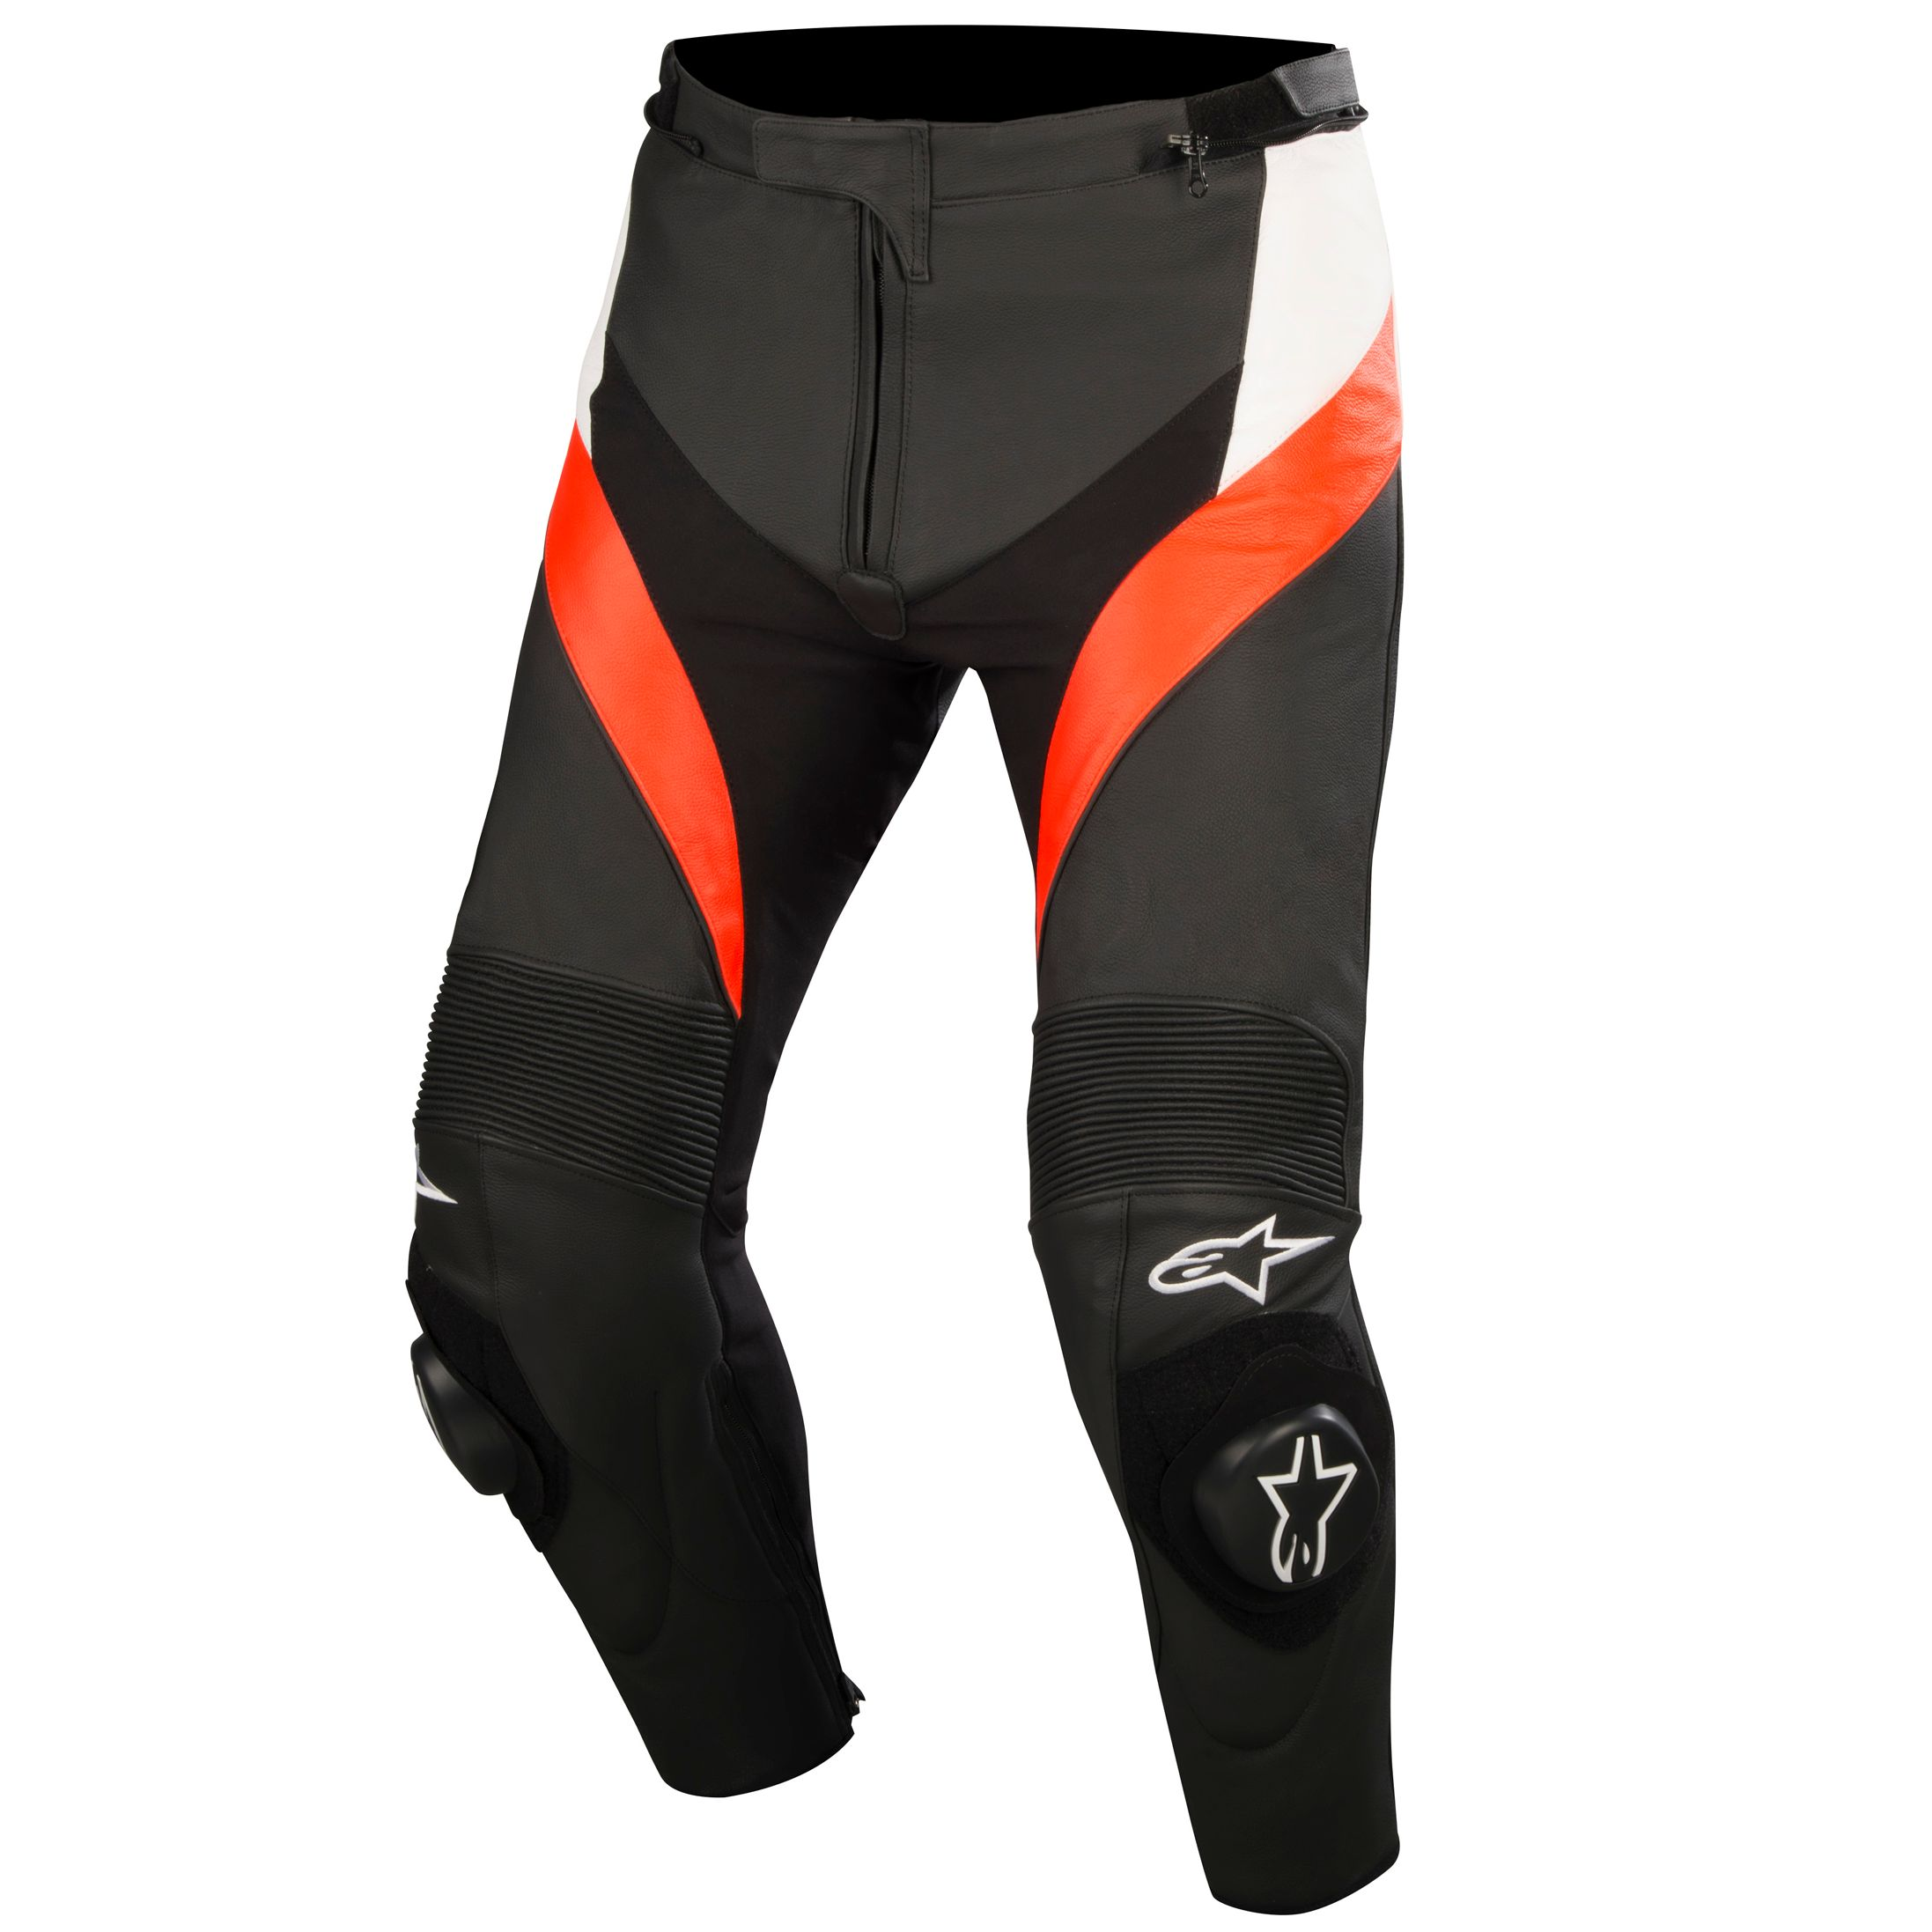 Guide taille pantalon moto alpinestar